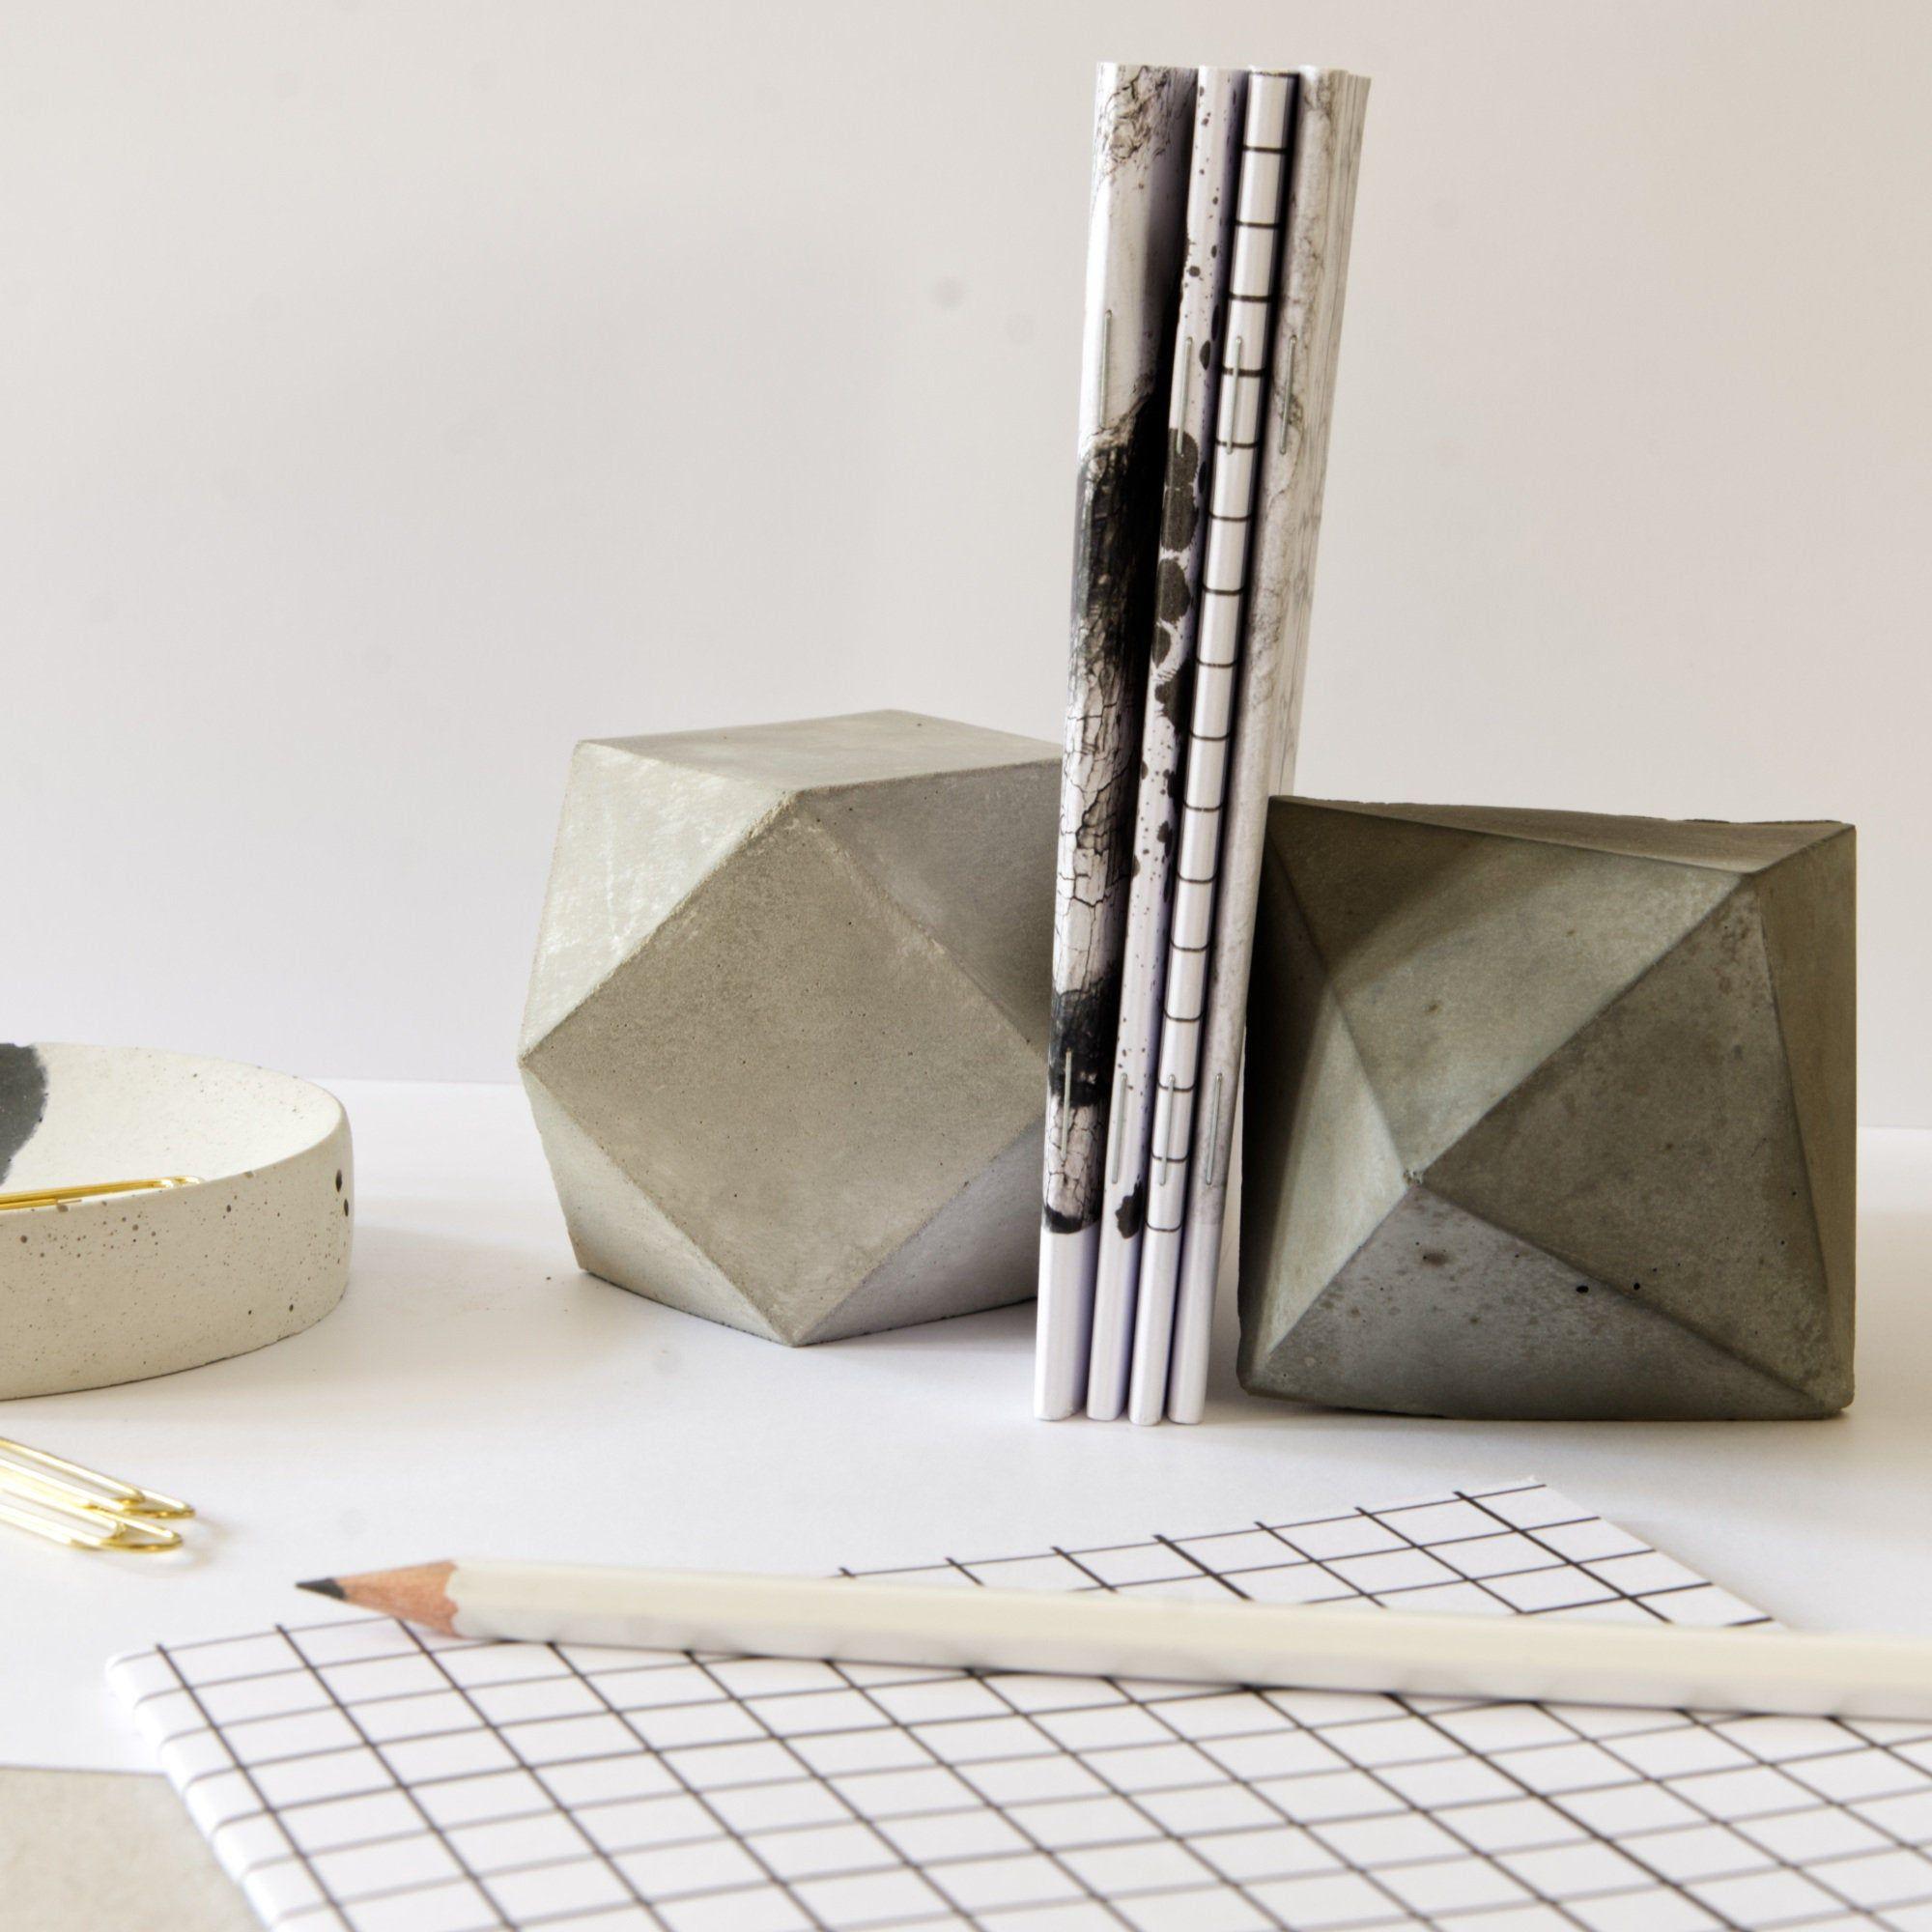 Geometric Concrete Decor Modern Modular Sculpture Art Set Of 2 Paperweight Bookend Minimal Industrial Office Or Home Decor Gift Set Concrete Decor Geometric Bookends